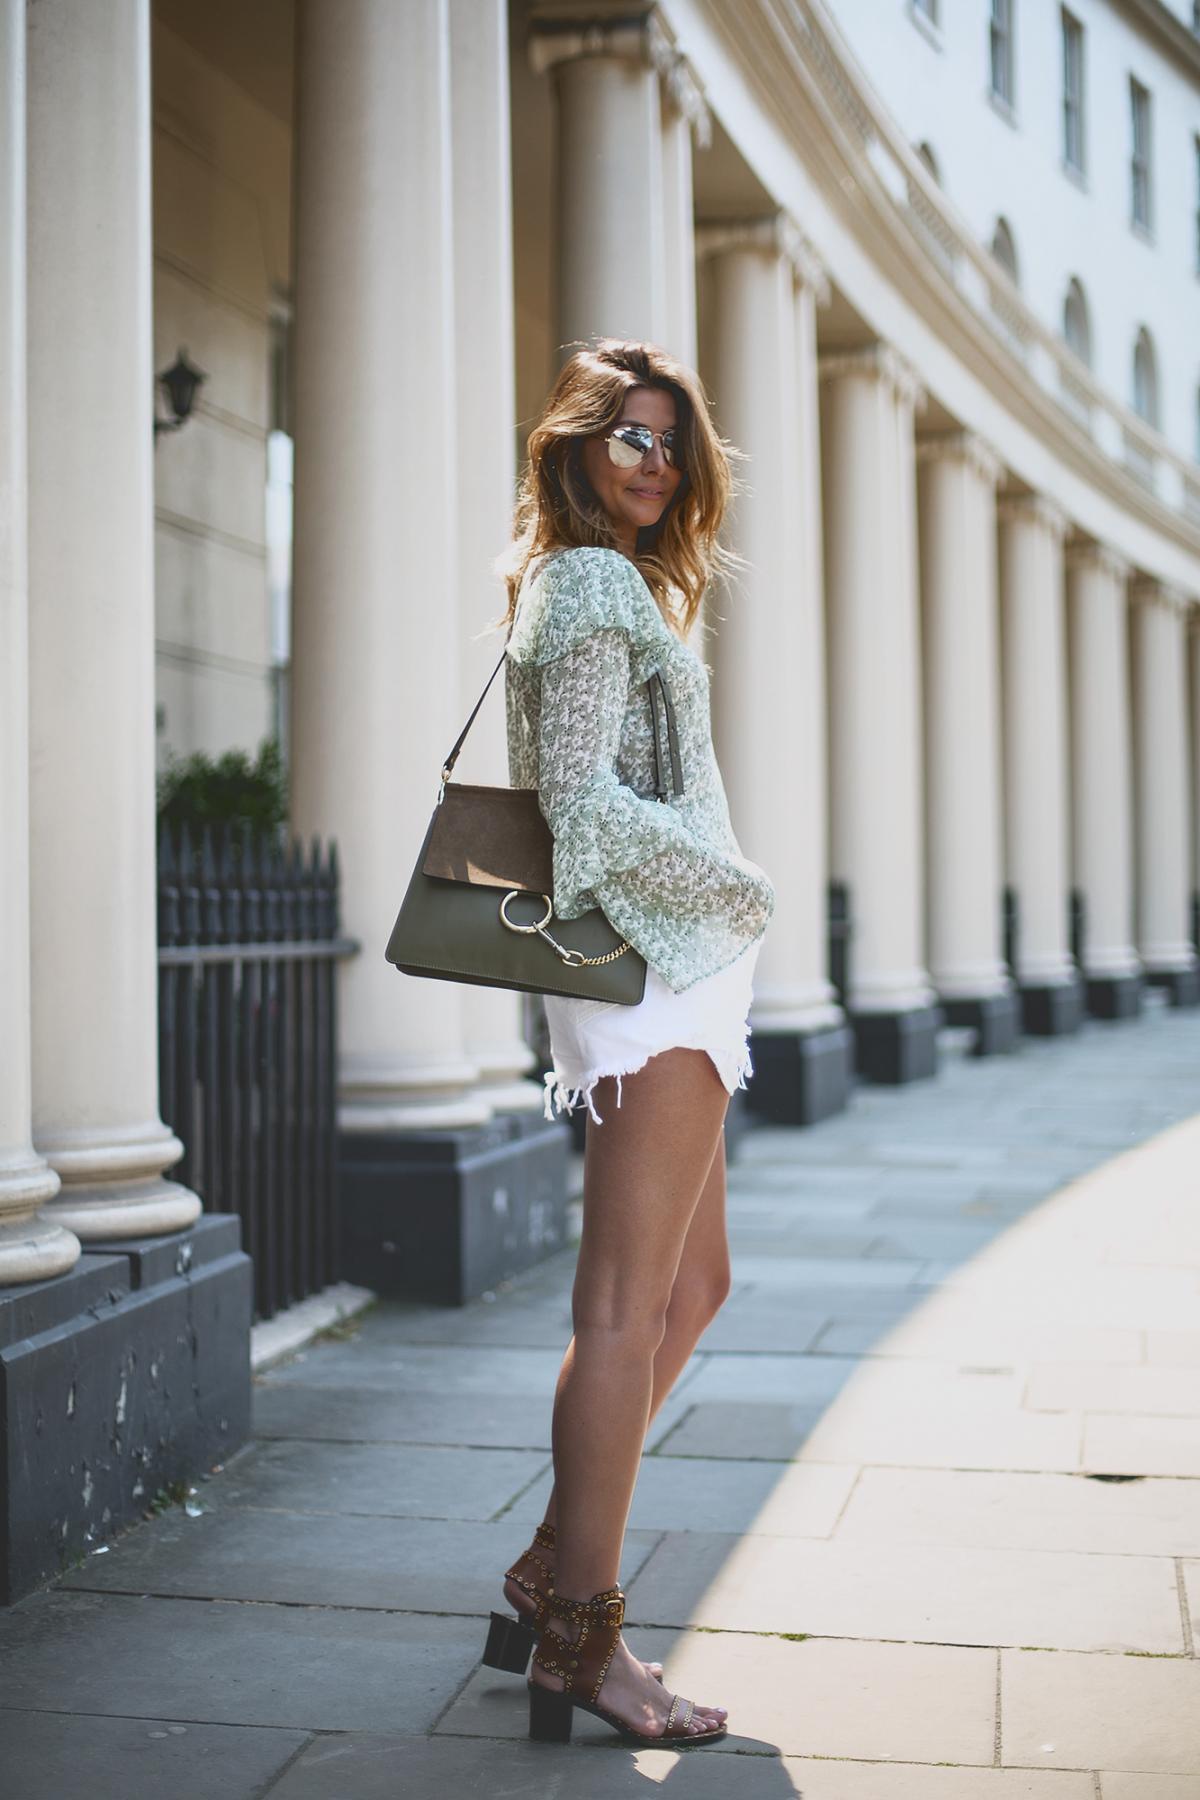 Green floaty top, white ripped denim shorts, khaki chloe faye bag, tan isabel marant sandals